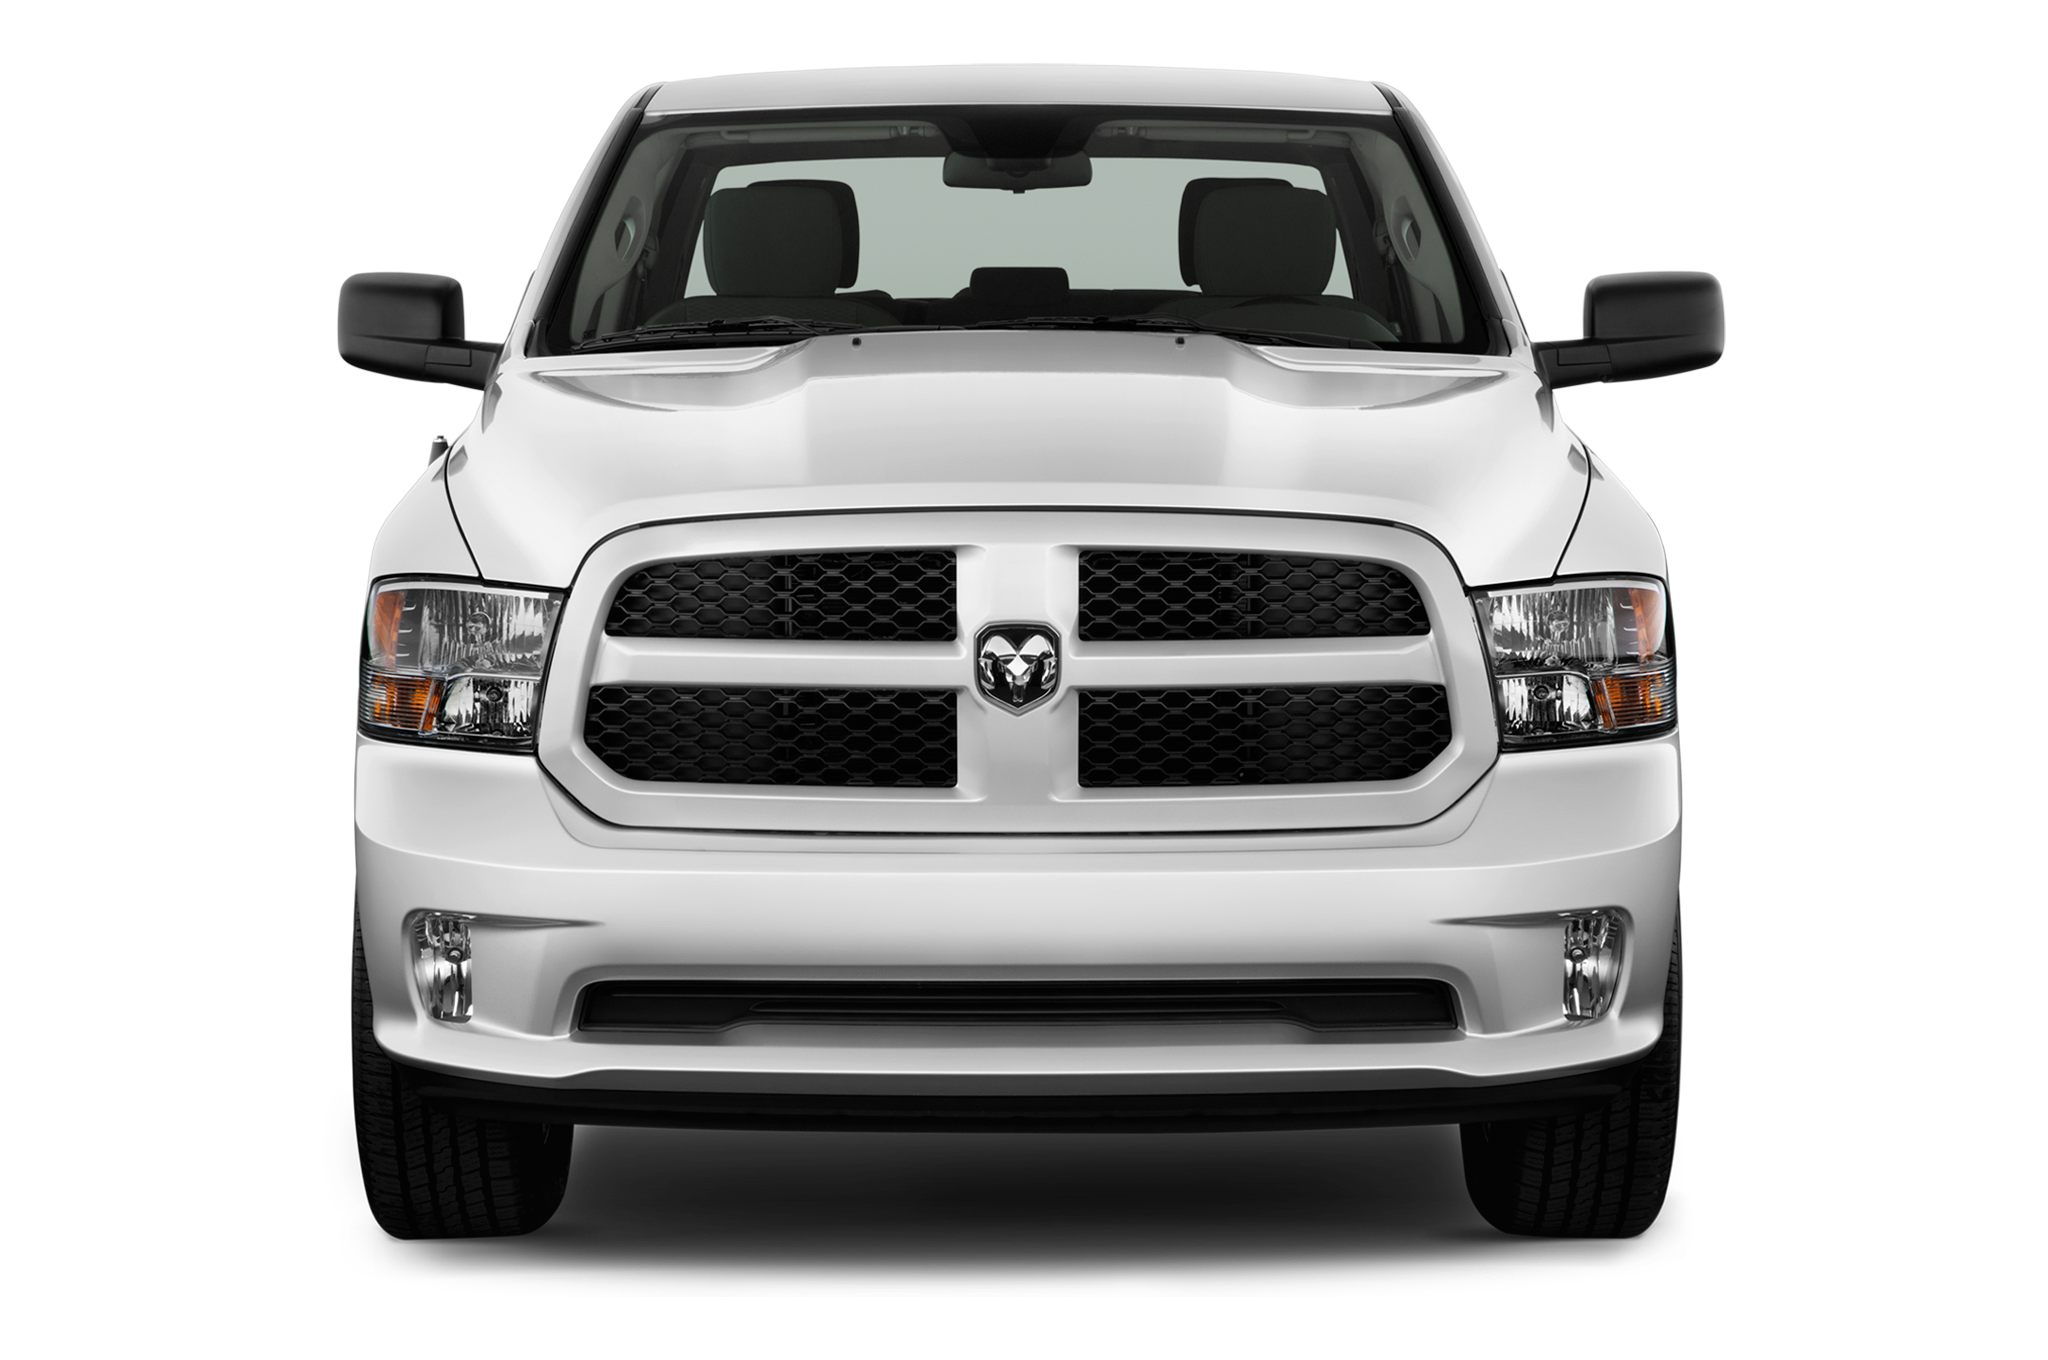 Factory Navigation Options Bullet Audio Sunroof Leather 2014 Dodge Ram 1500 Radio 2013 17 Oem 84 Nav Satellite And Uconnect Upgradeany